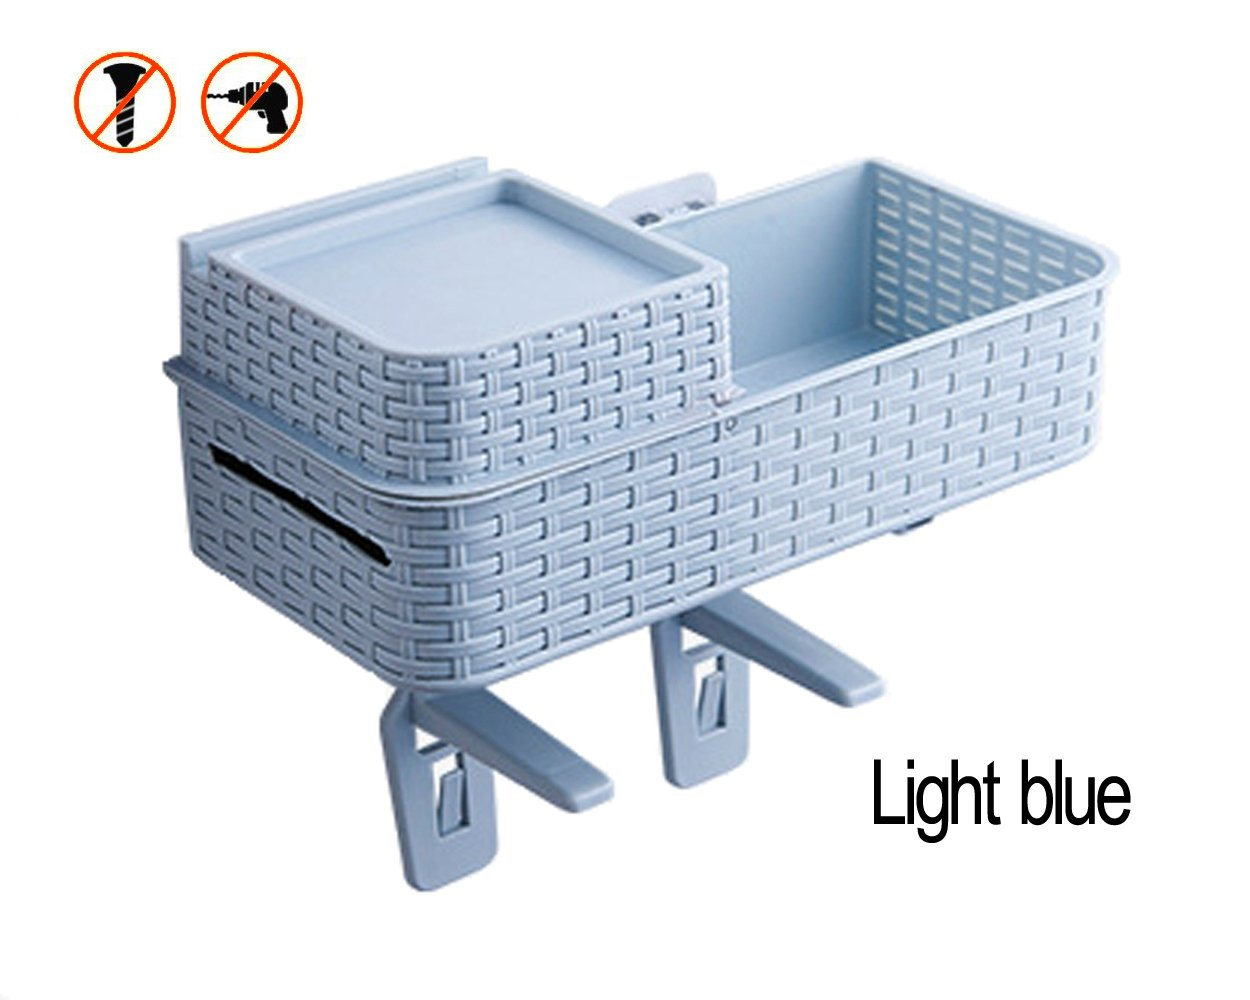 Acstar Multi-functional Suction Wall Toilet Rack Bathroom Hanging Storage Rack Kitchen Storage Basket Desktop Storage Basket Exempt from Punching Waterproof (Light blue) by Acstar (Image #2)